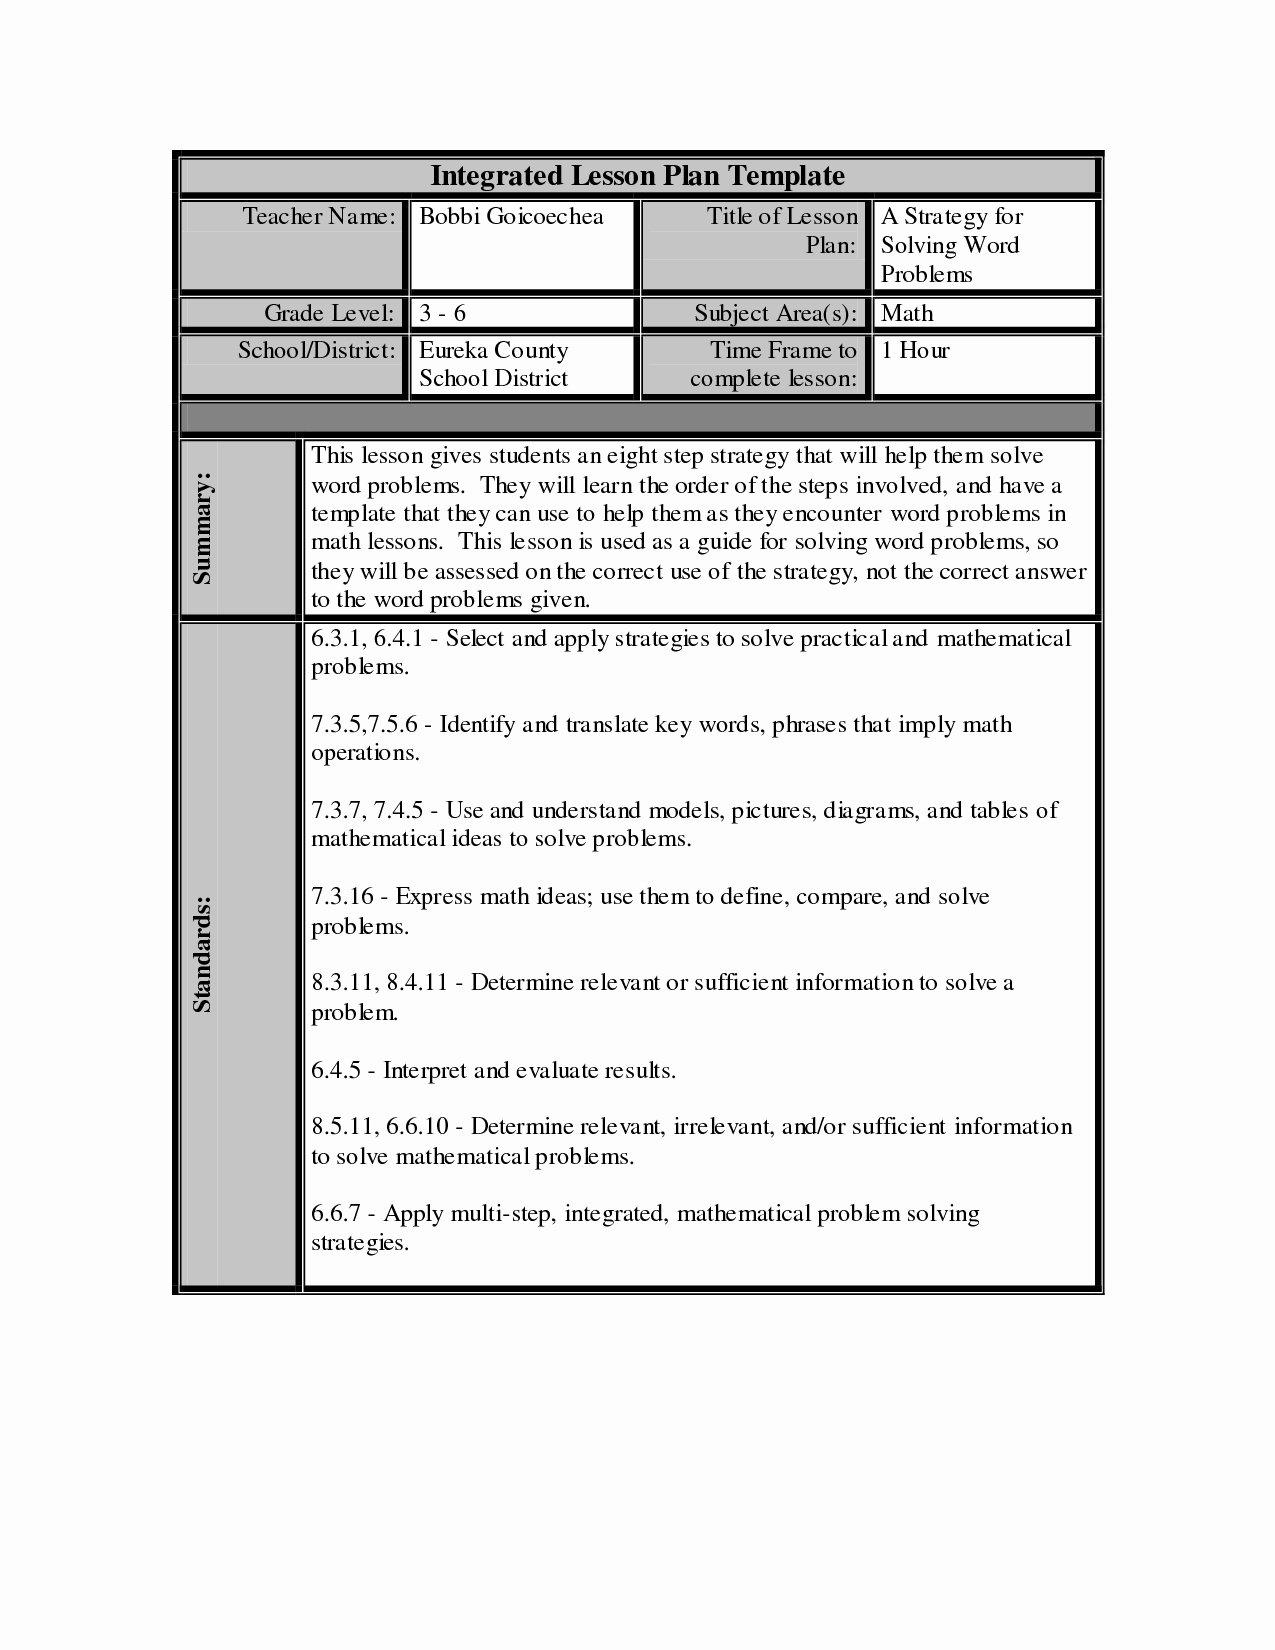 Lesson Plan Template Word Elegant Lesson Plan Template Word